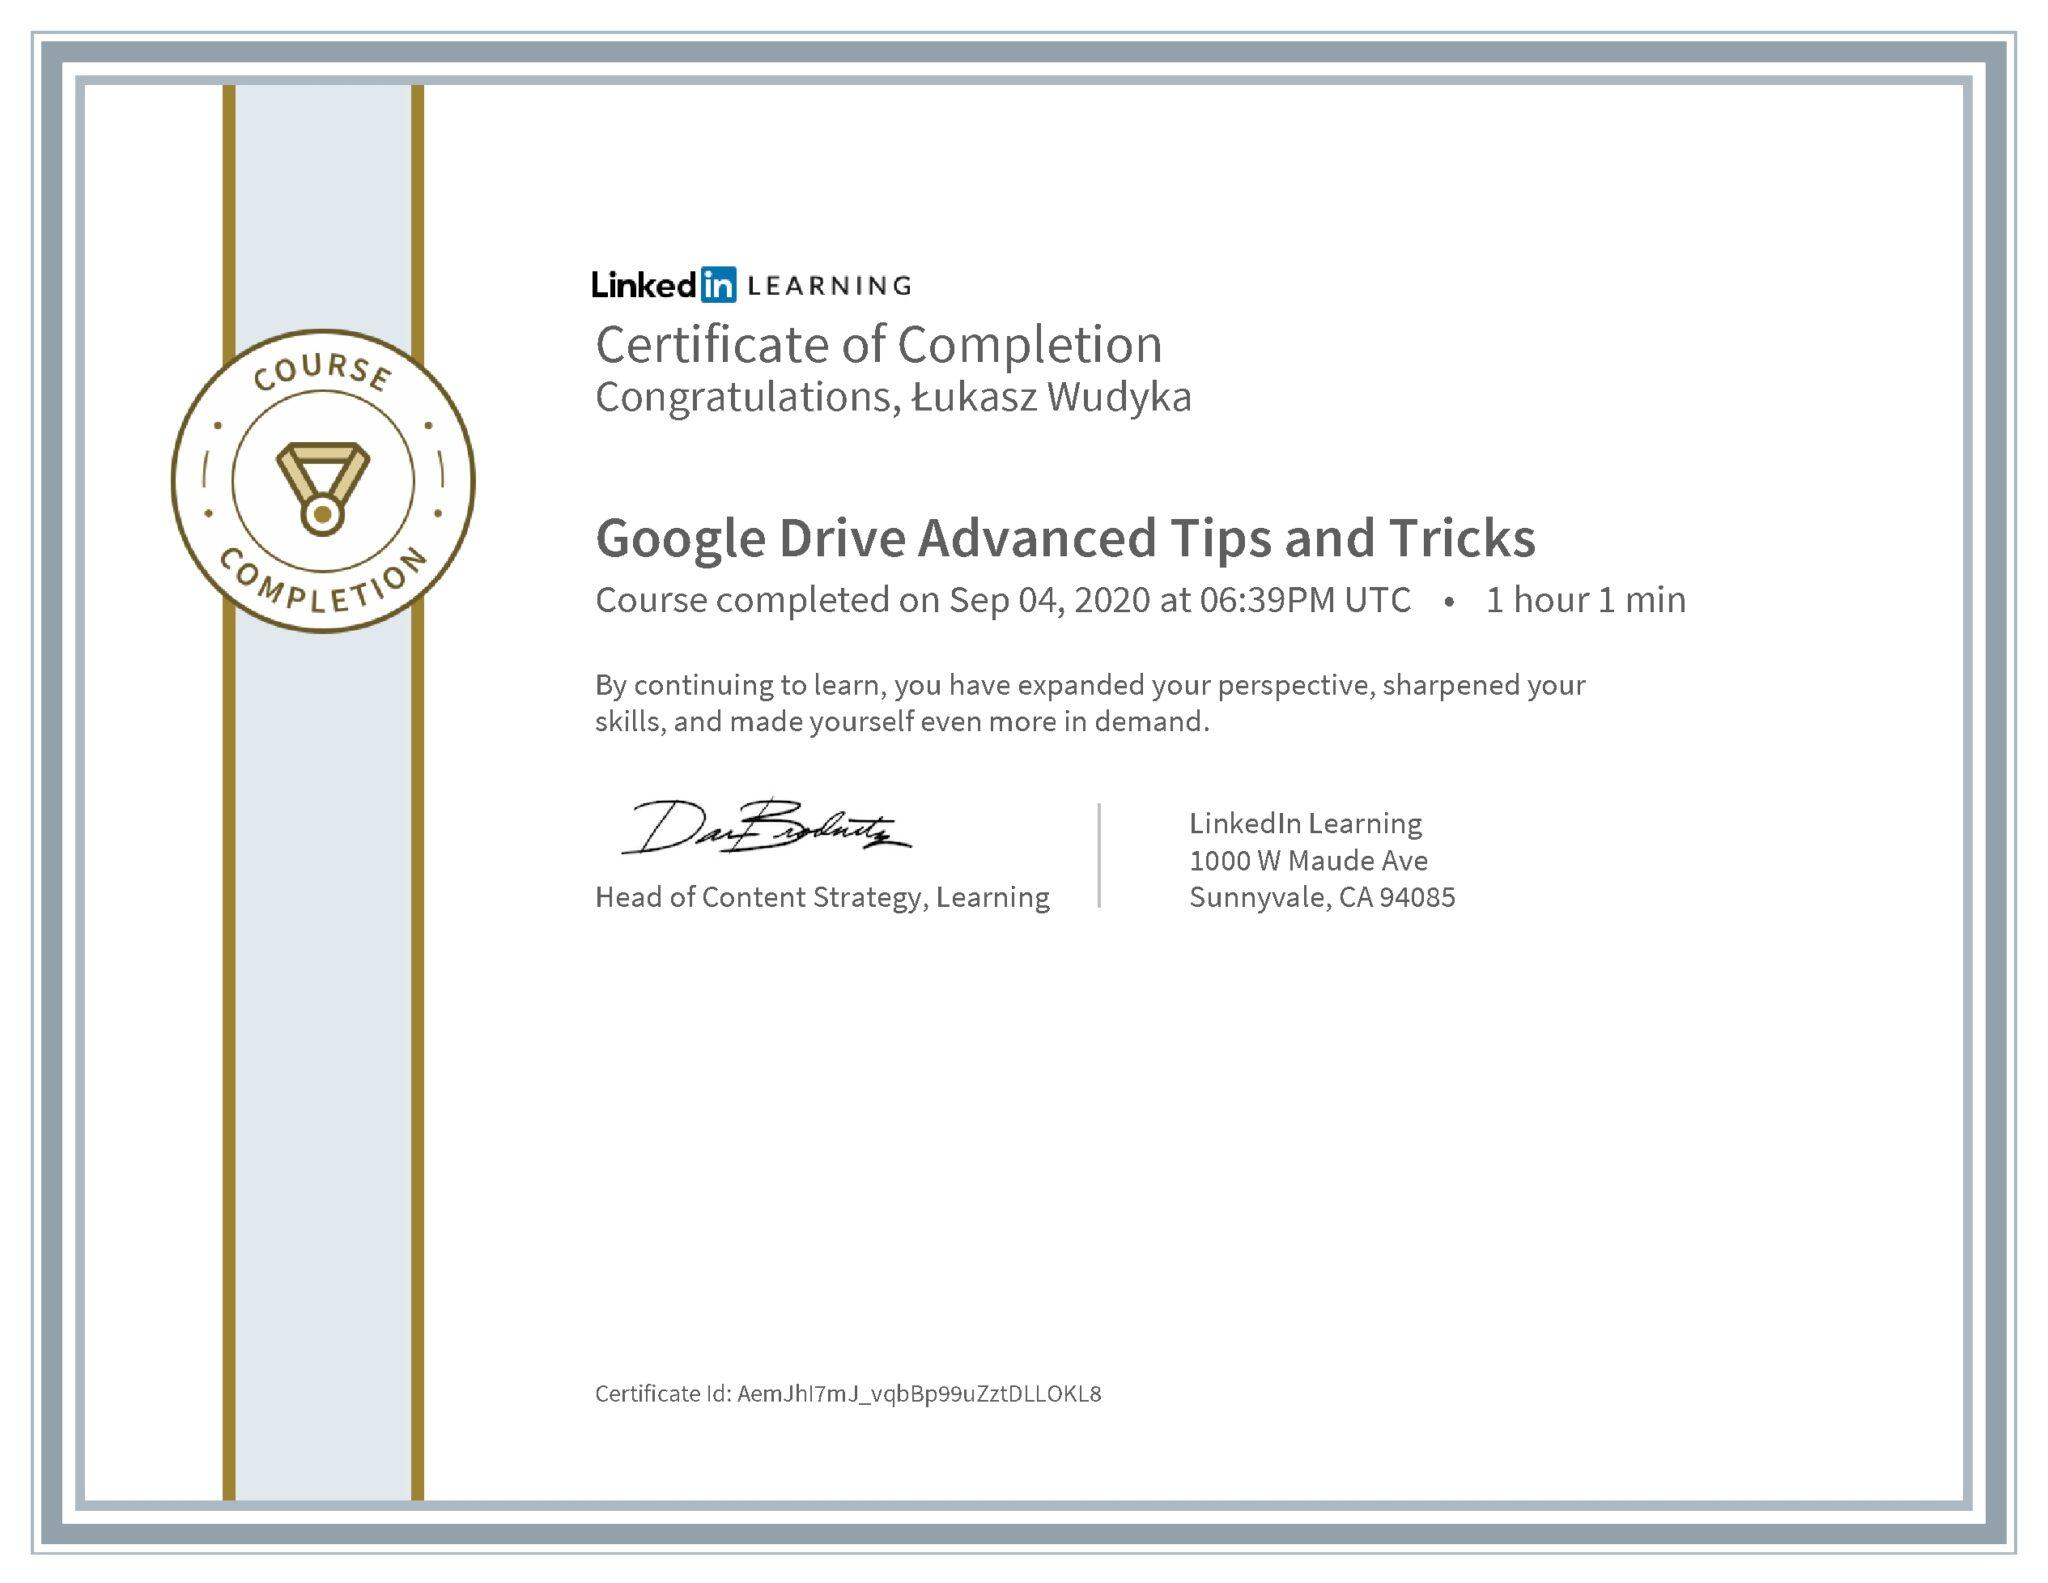 Łukasz Wudyka certyfikat LinkedIn Google Drive Advanced Tips and Tricks